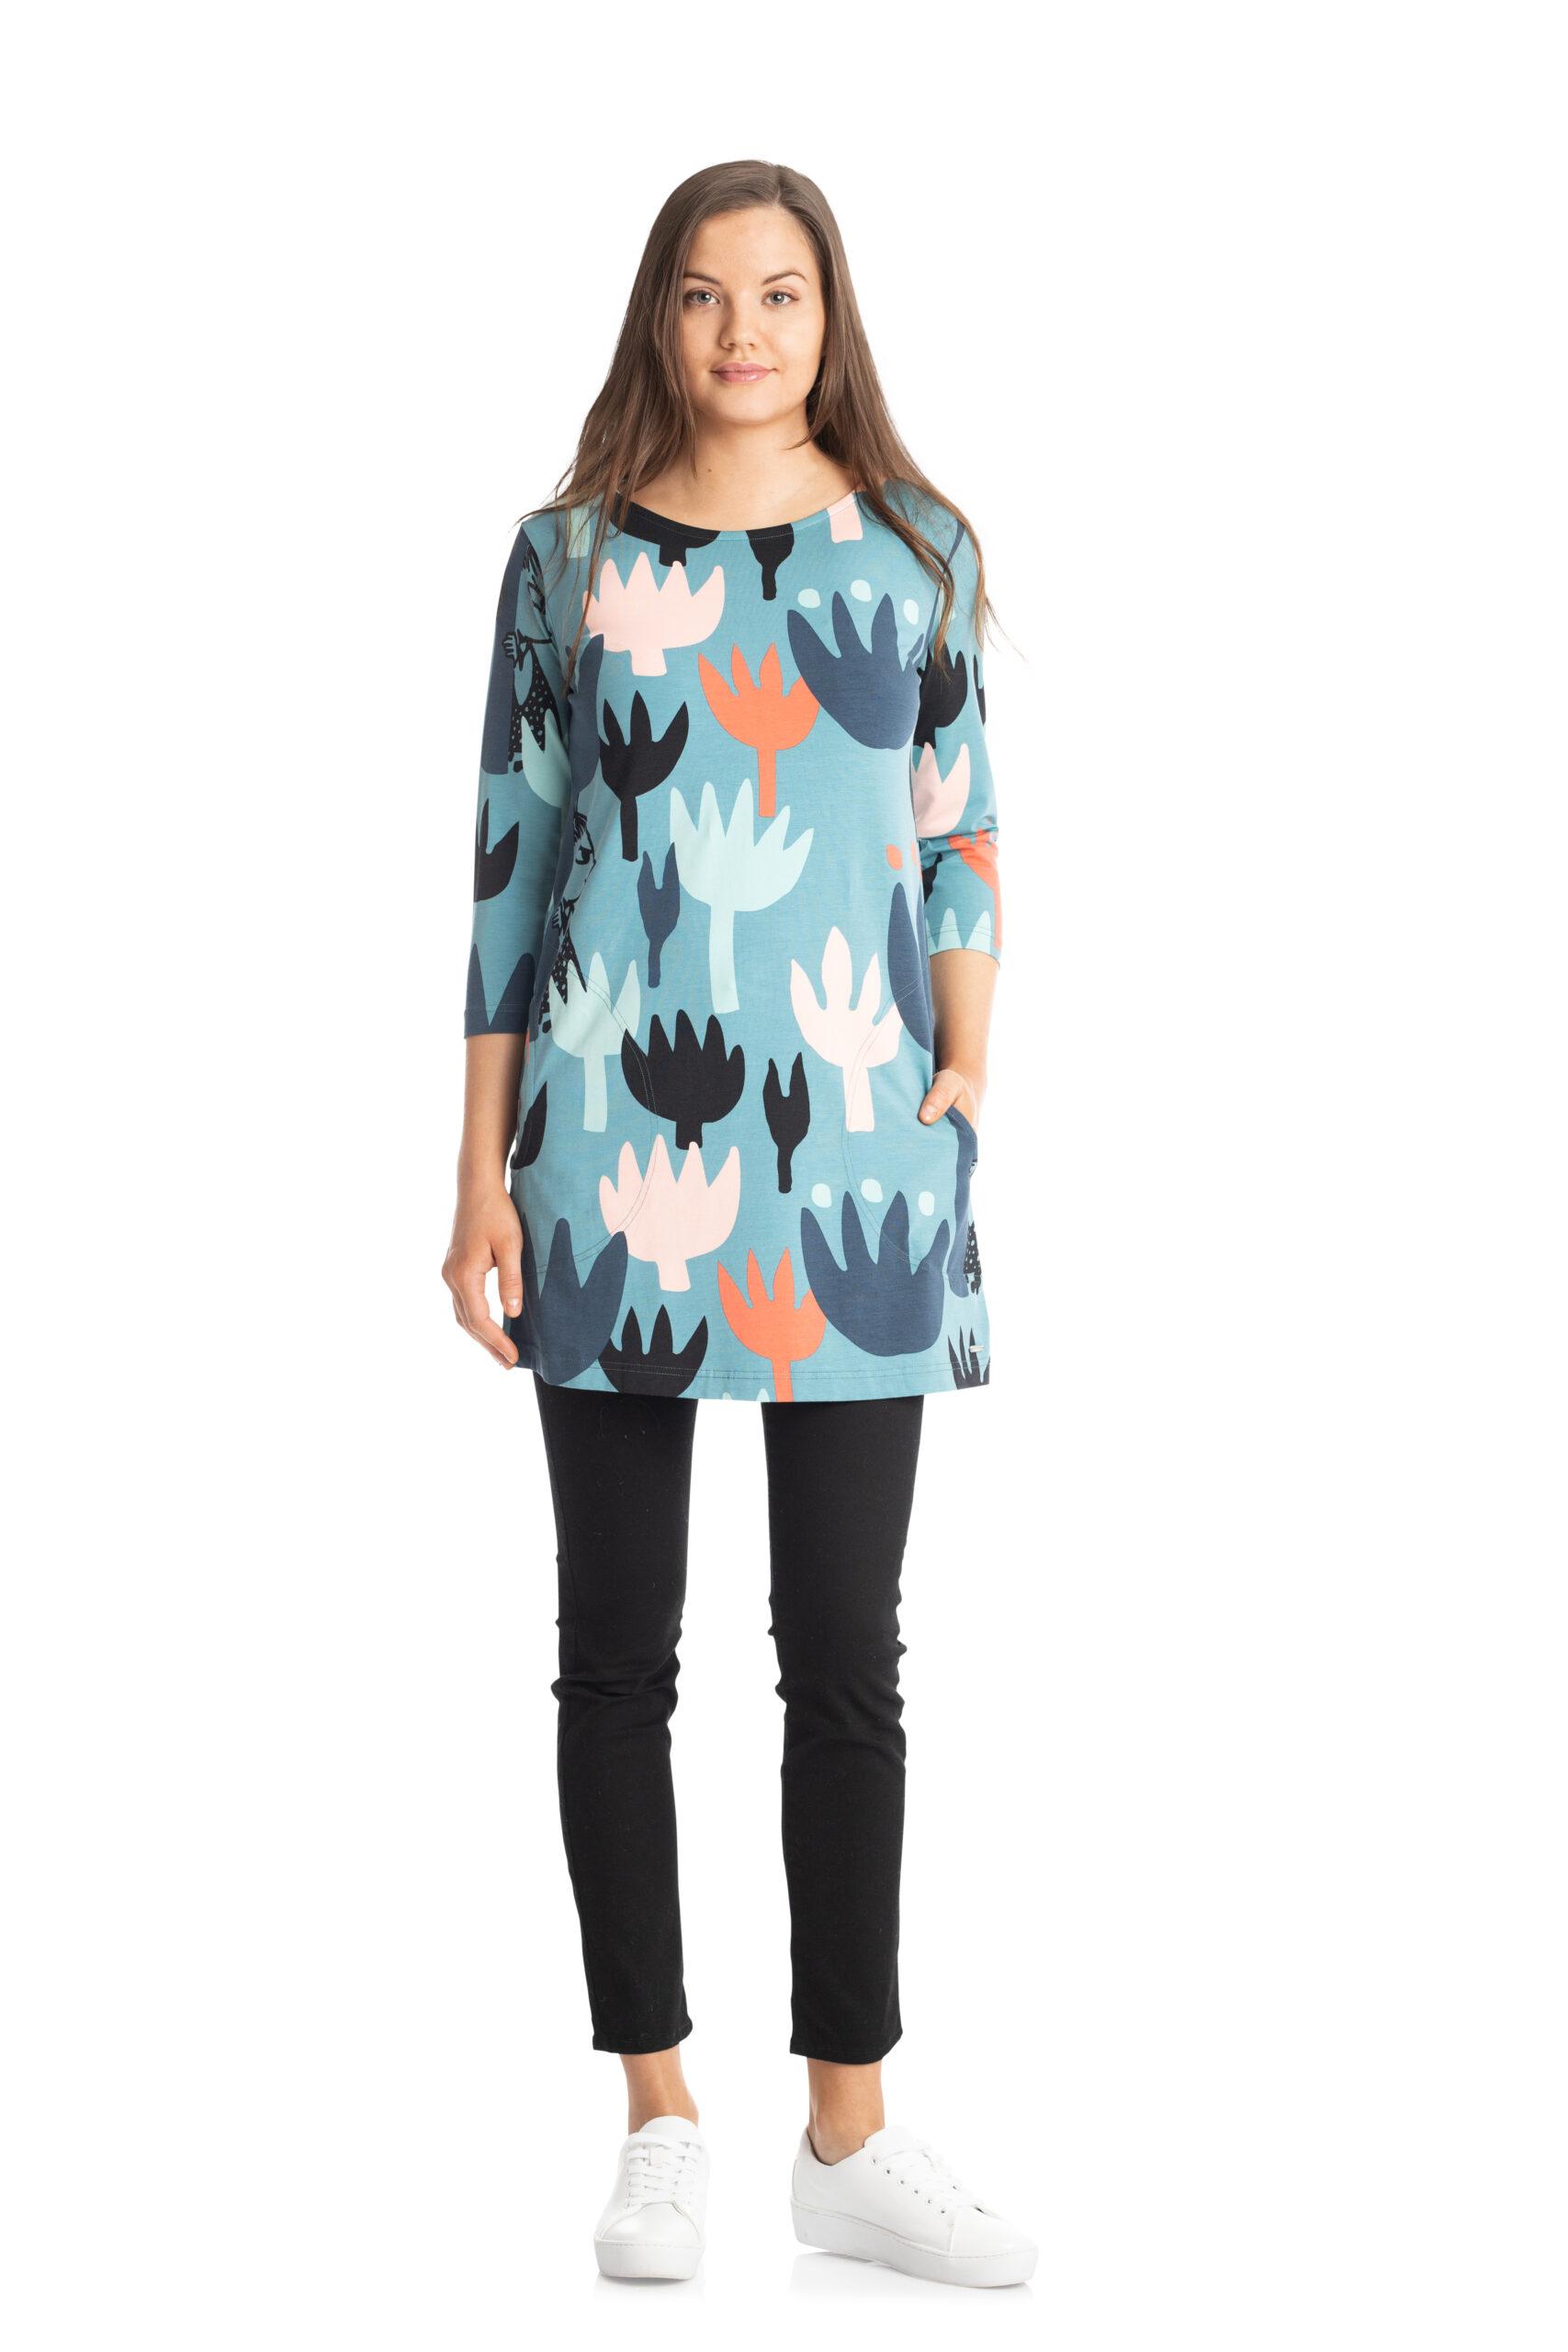 Martinex Moomin Hilda Tunic Tulip Turquoise